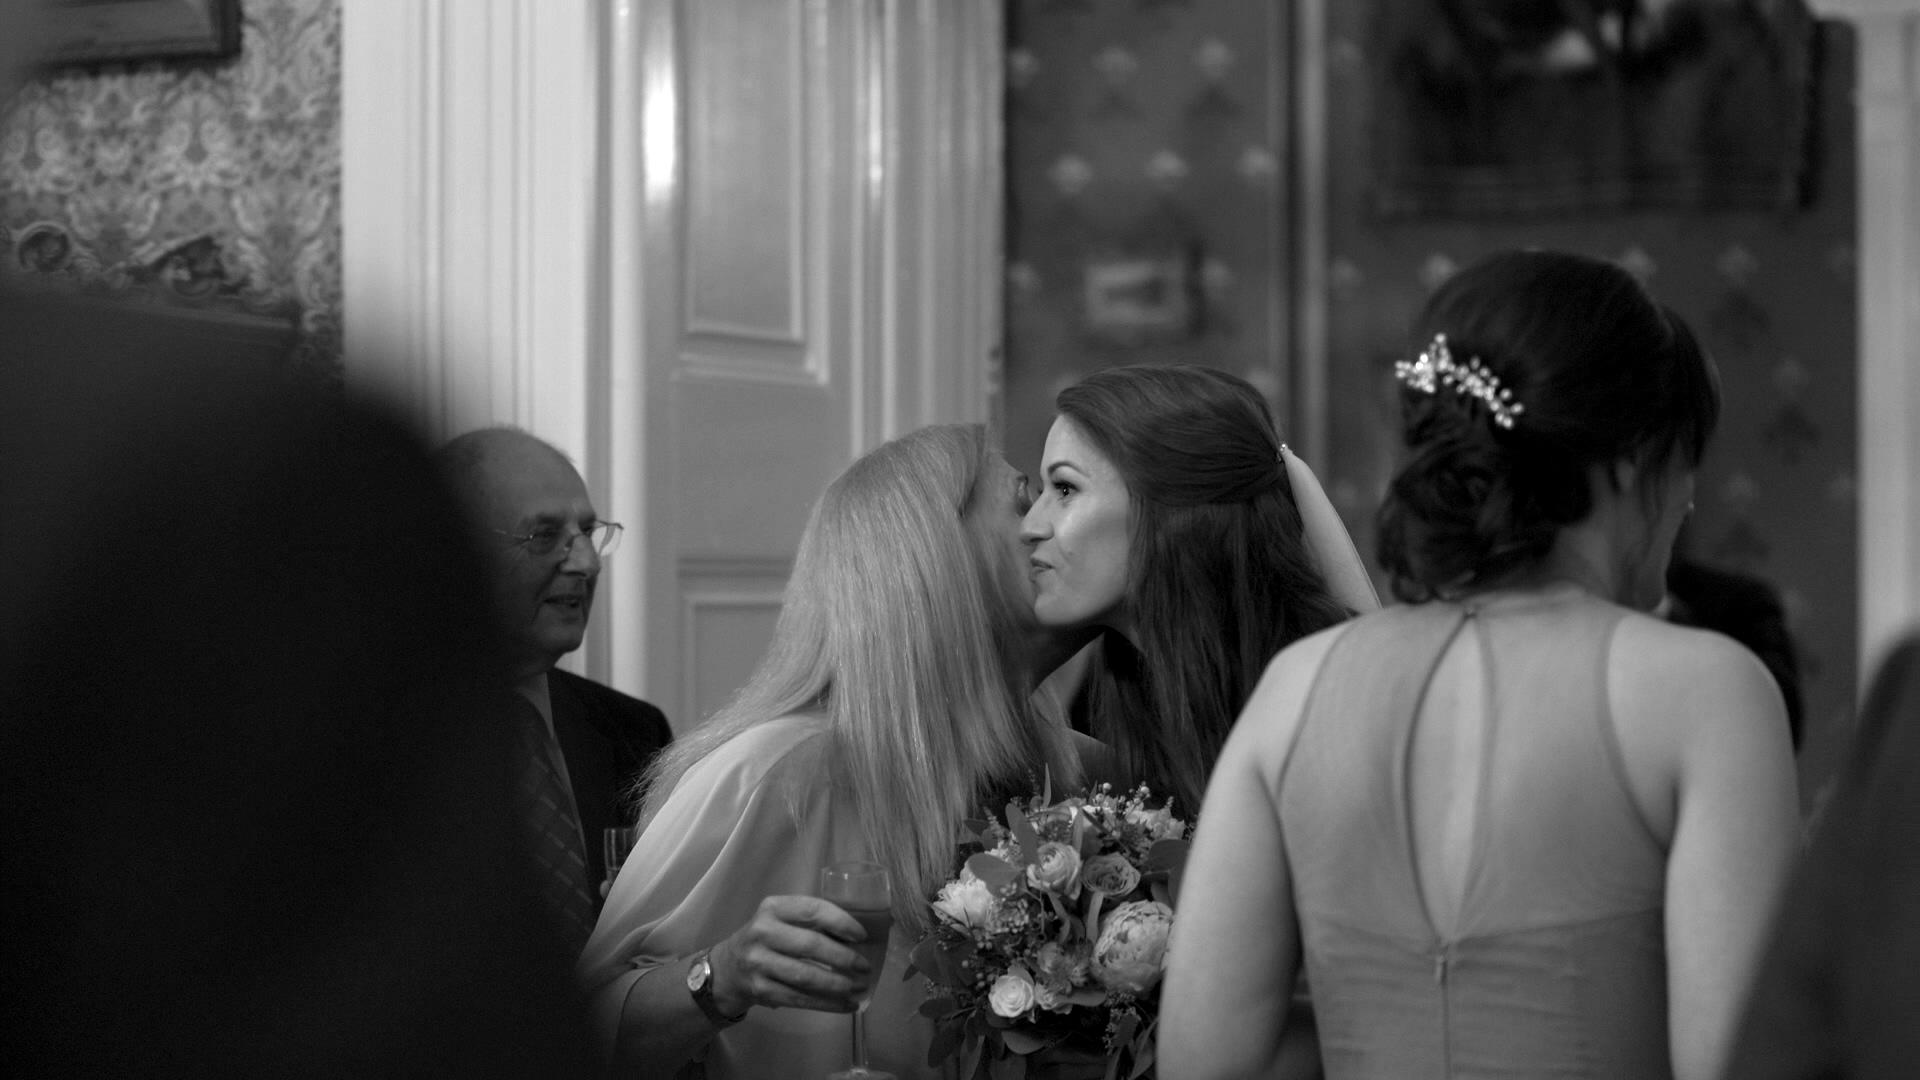 DRUMTOCHTY-SUMMER-WEDDING (17).jpg